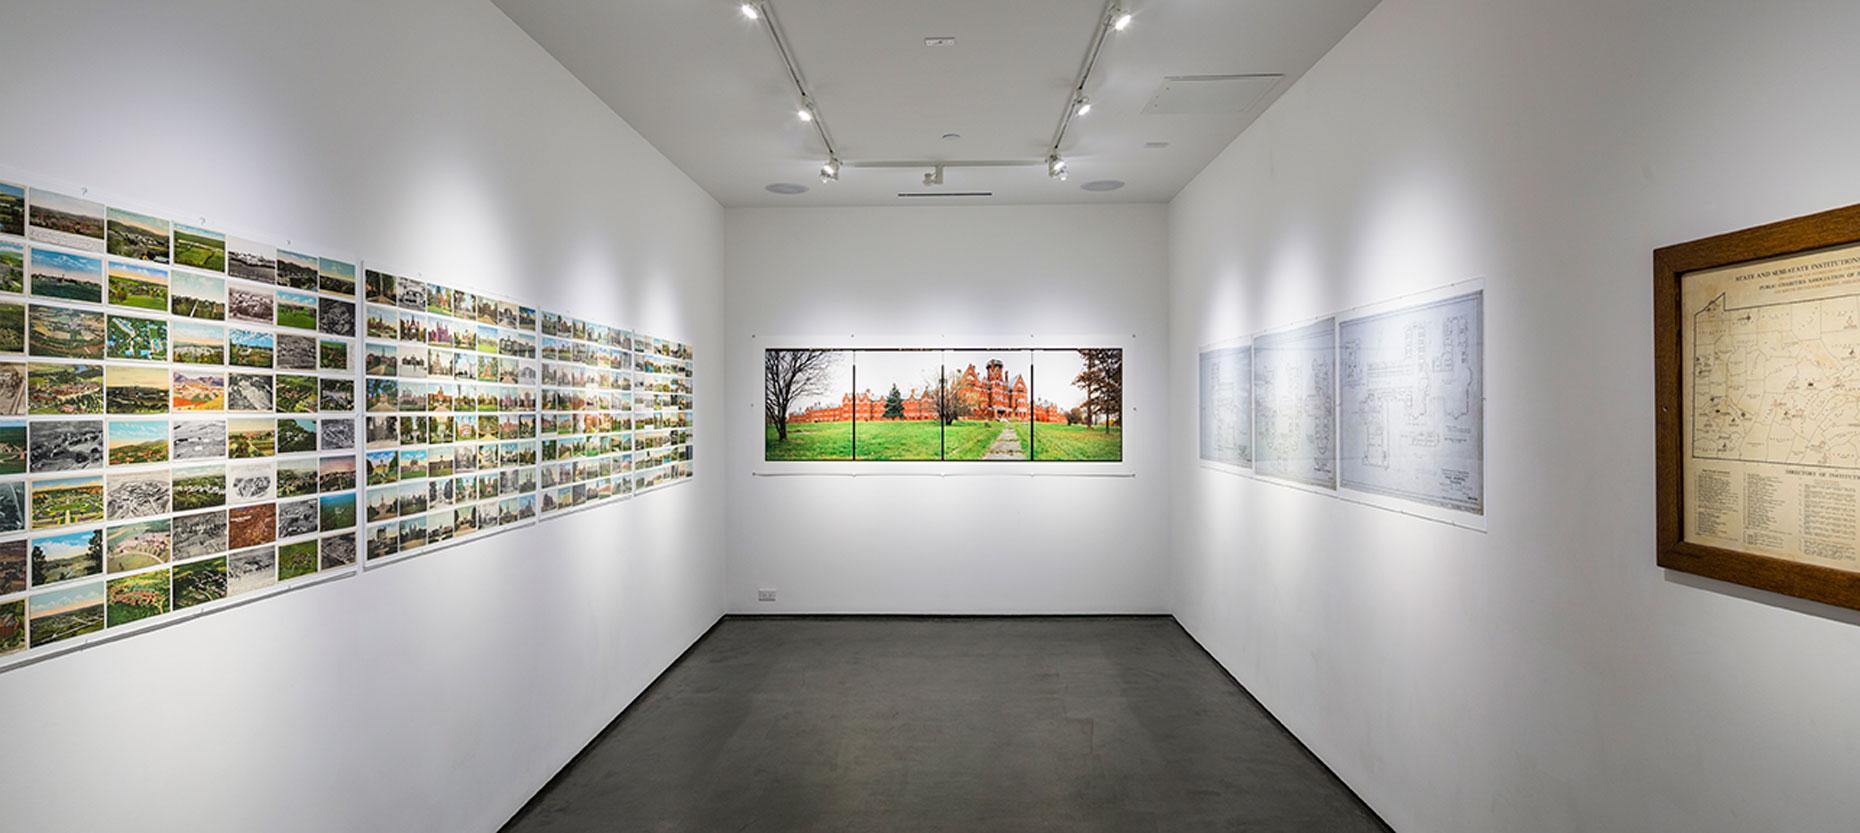 Asylum , Benrubi Gallery, New York, NY, 2016